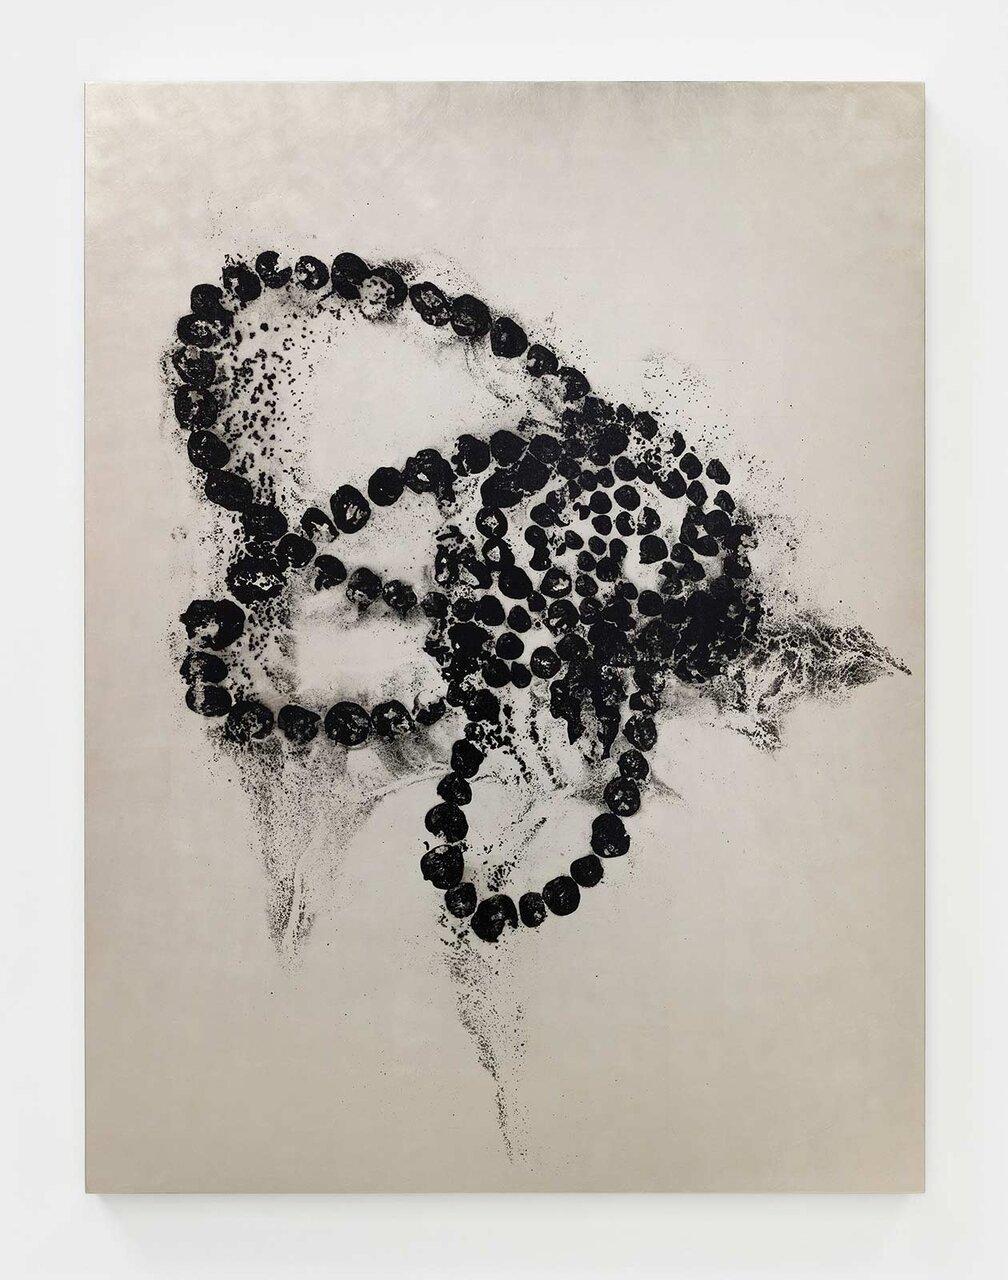 Jean-Michel OTHONIEL Kiku Chrysanteme, painting on canvas, black ink on white gold leaf, 164 x 124 x 5 cm © Jean-Michel Othoniel / JASPAR, Tokyo 2020 Photo: Claire Dorn /Courtesy of the artist and Perrotin